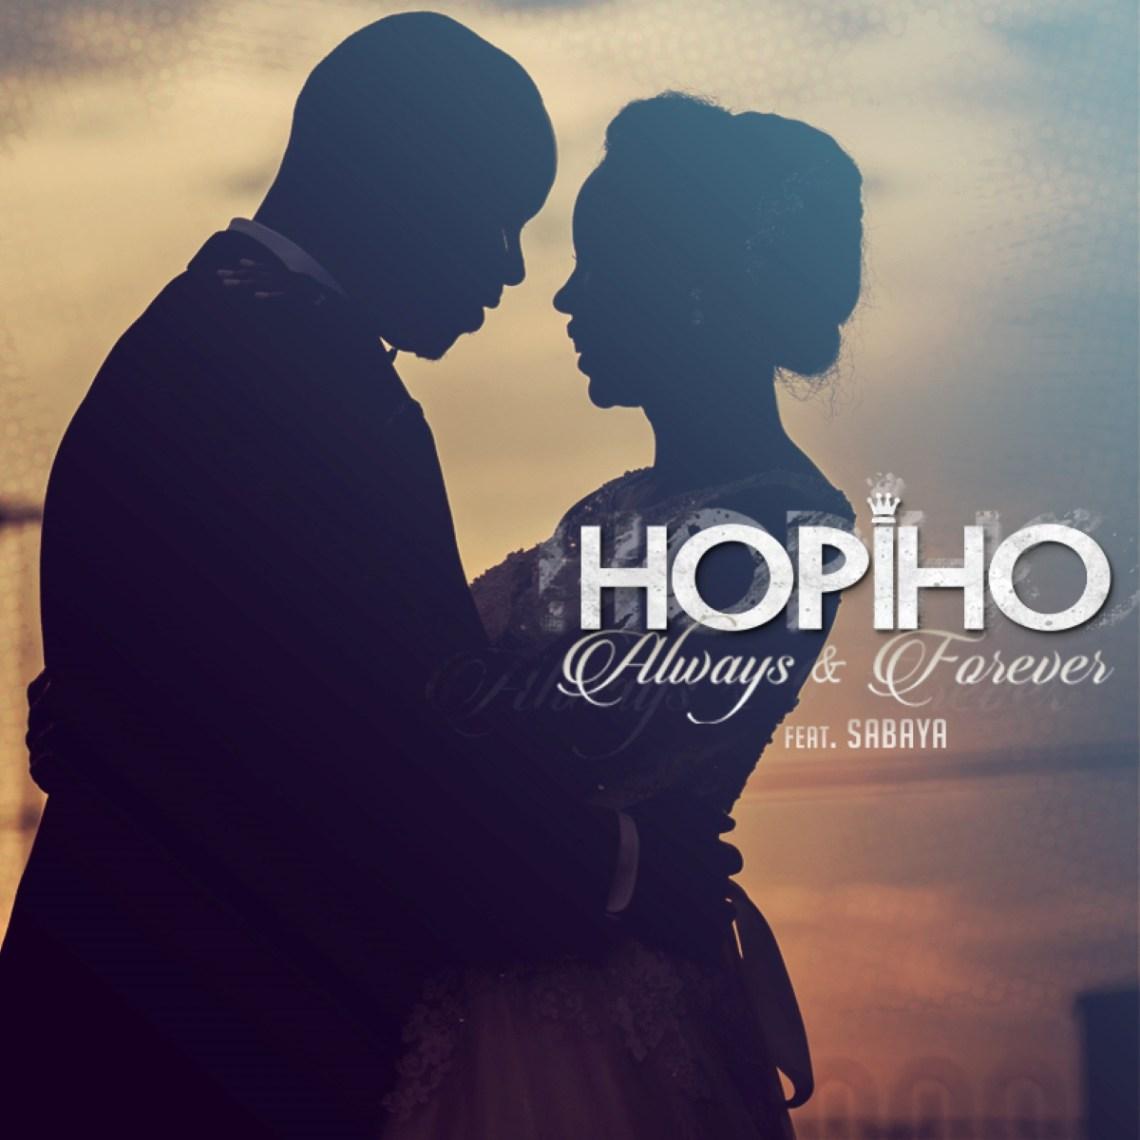 Hopiho - Always & Forever (feat. Sabaya)